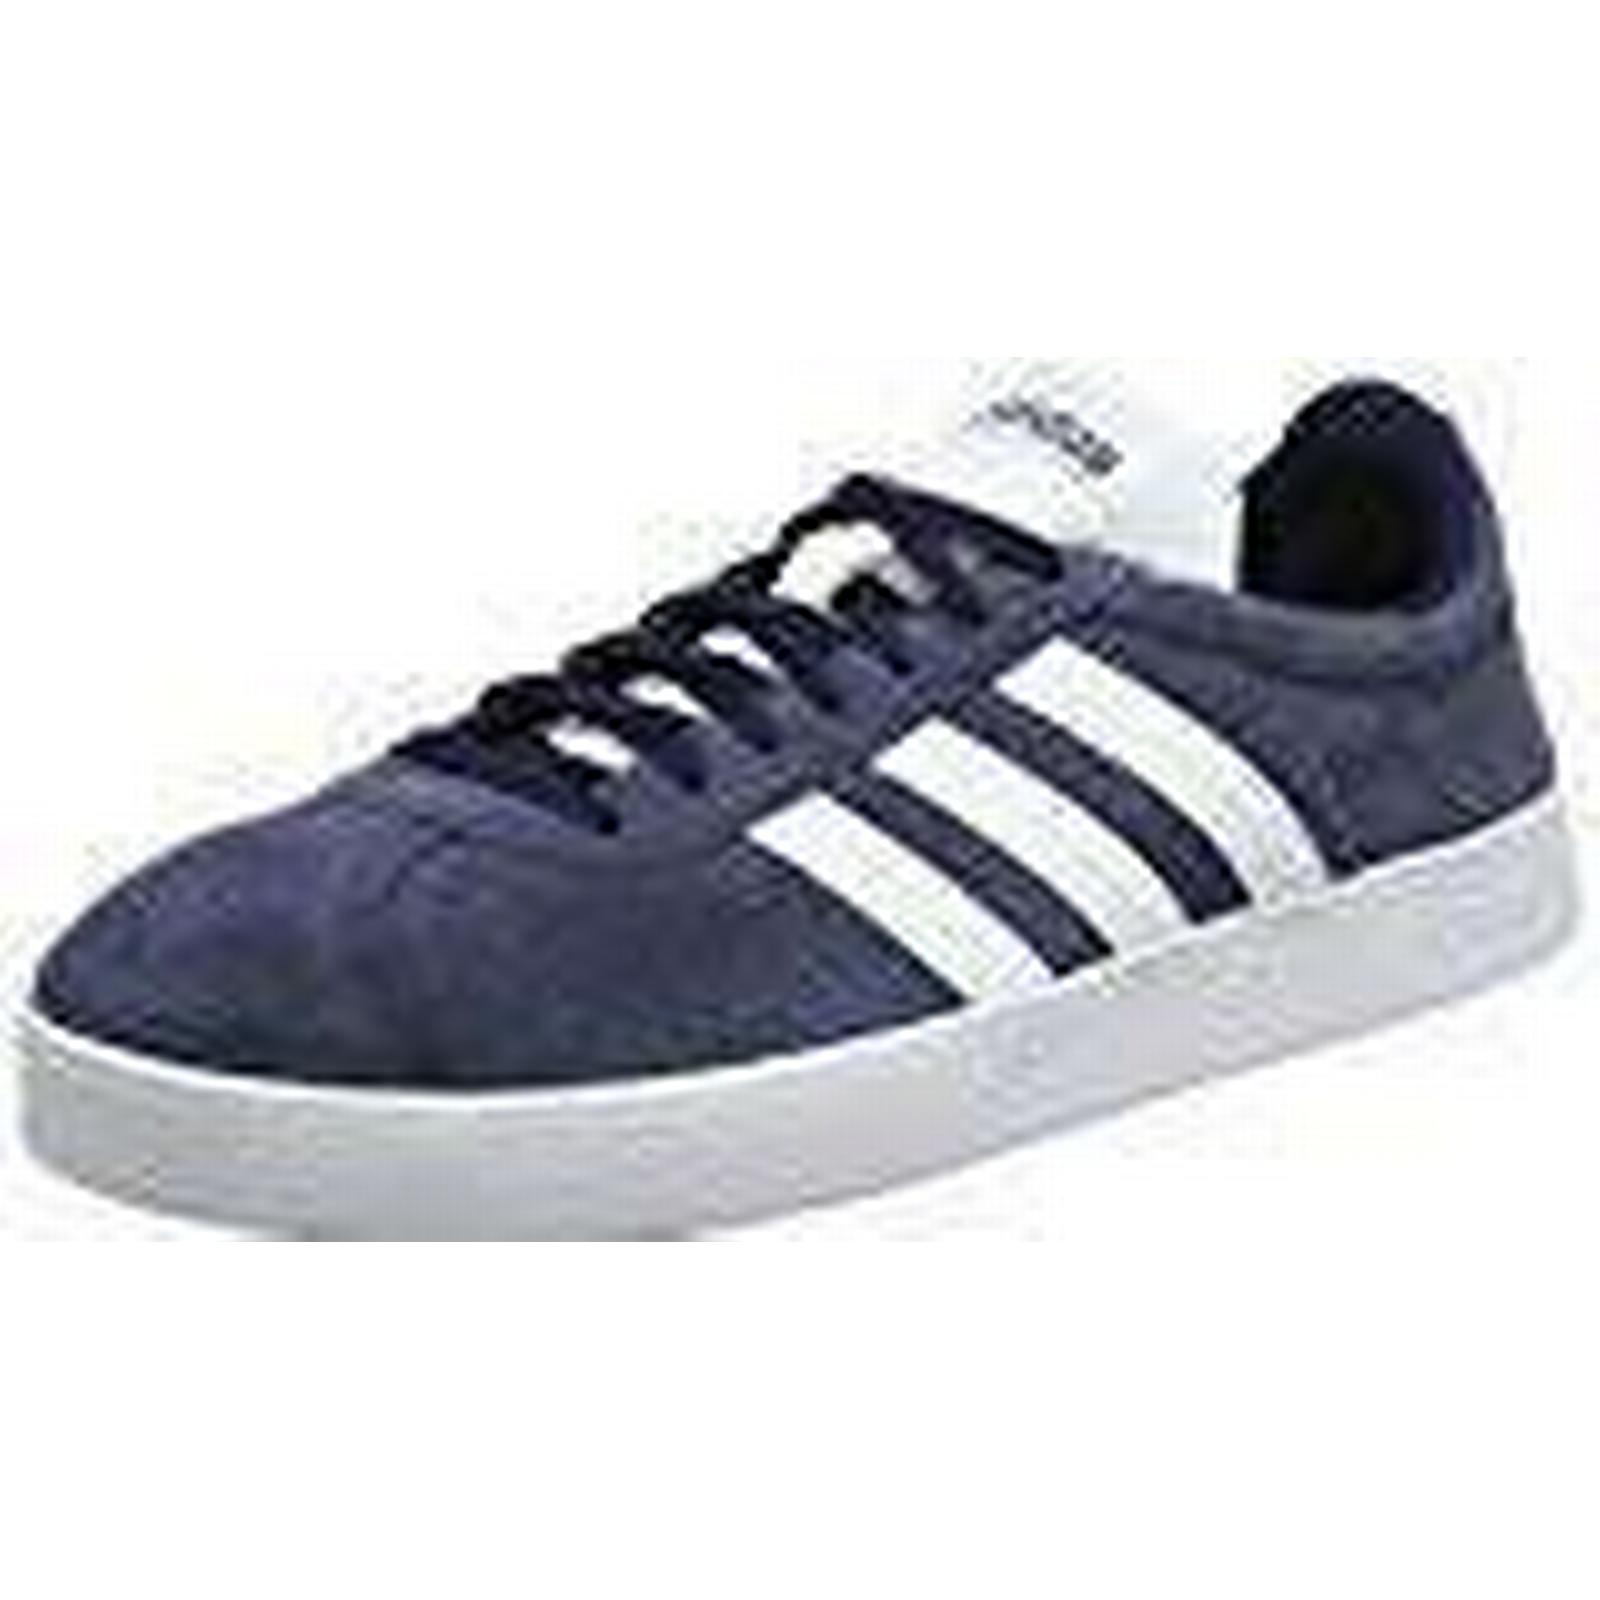 Adidas Men''s Vl Court 2.0 000), Fitness Shoes, Blue (Maruni/Ftwbla 000), 2.0 9.5 UK 9.5 UK ca2f4c